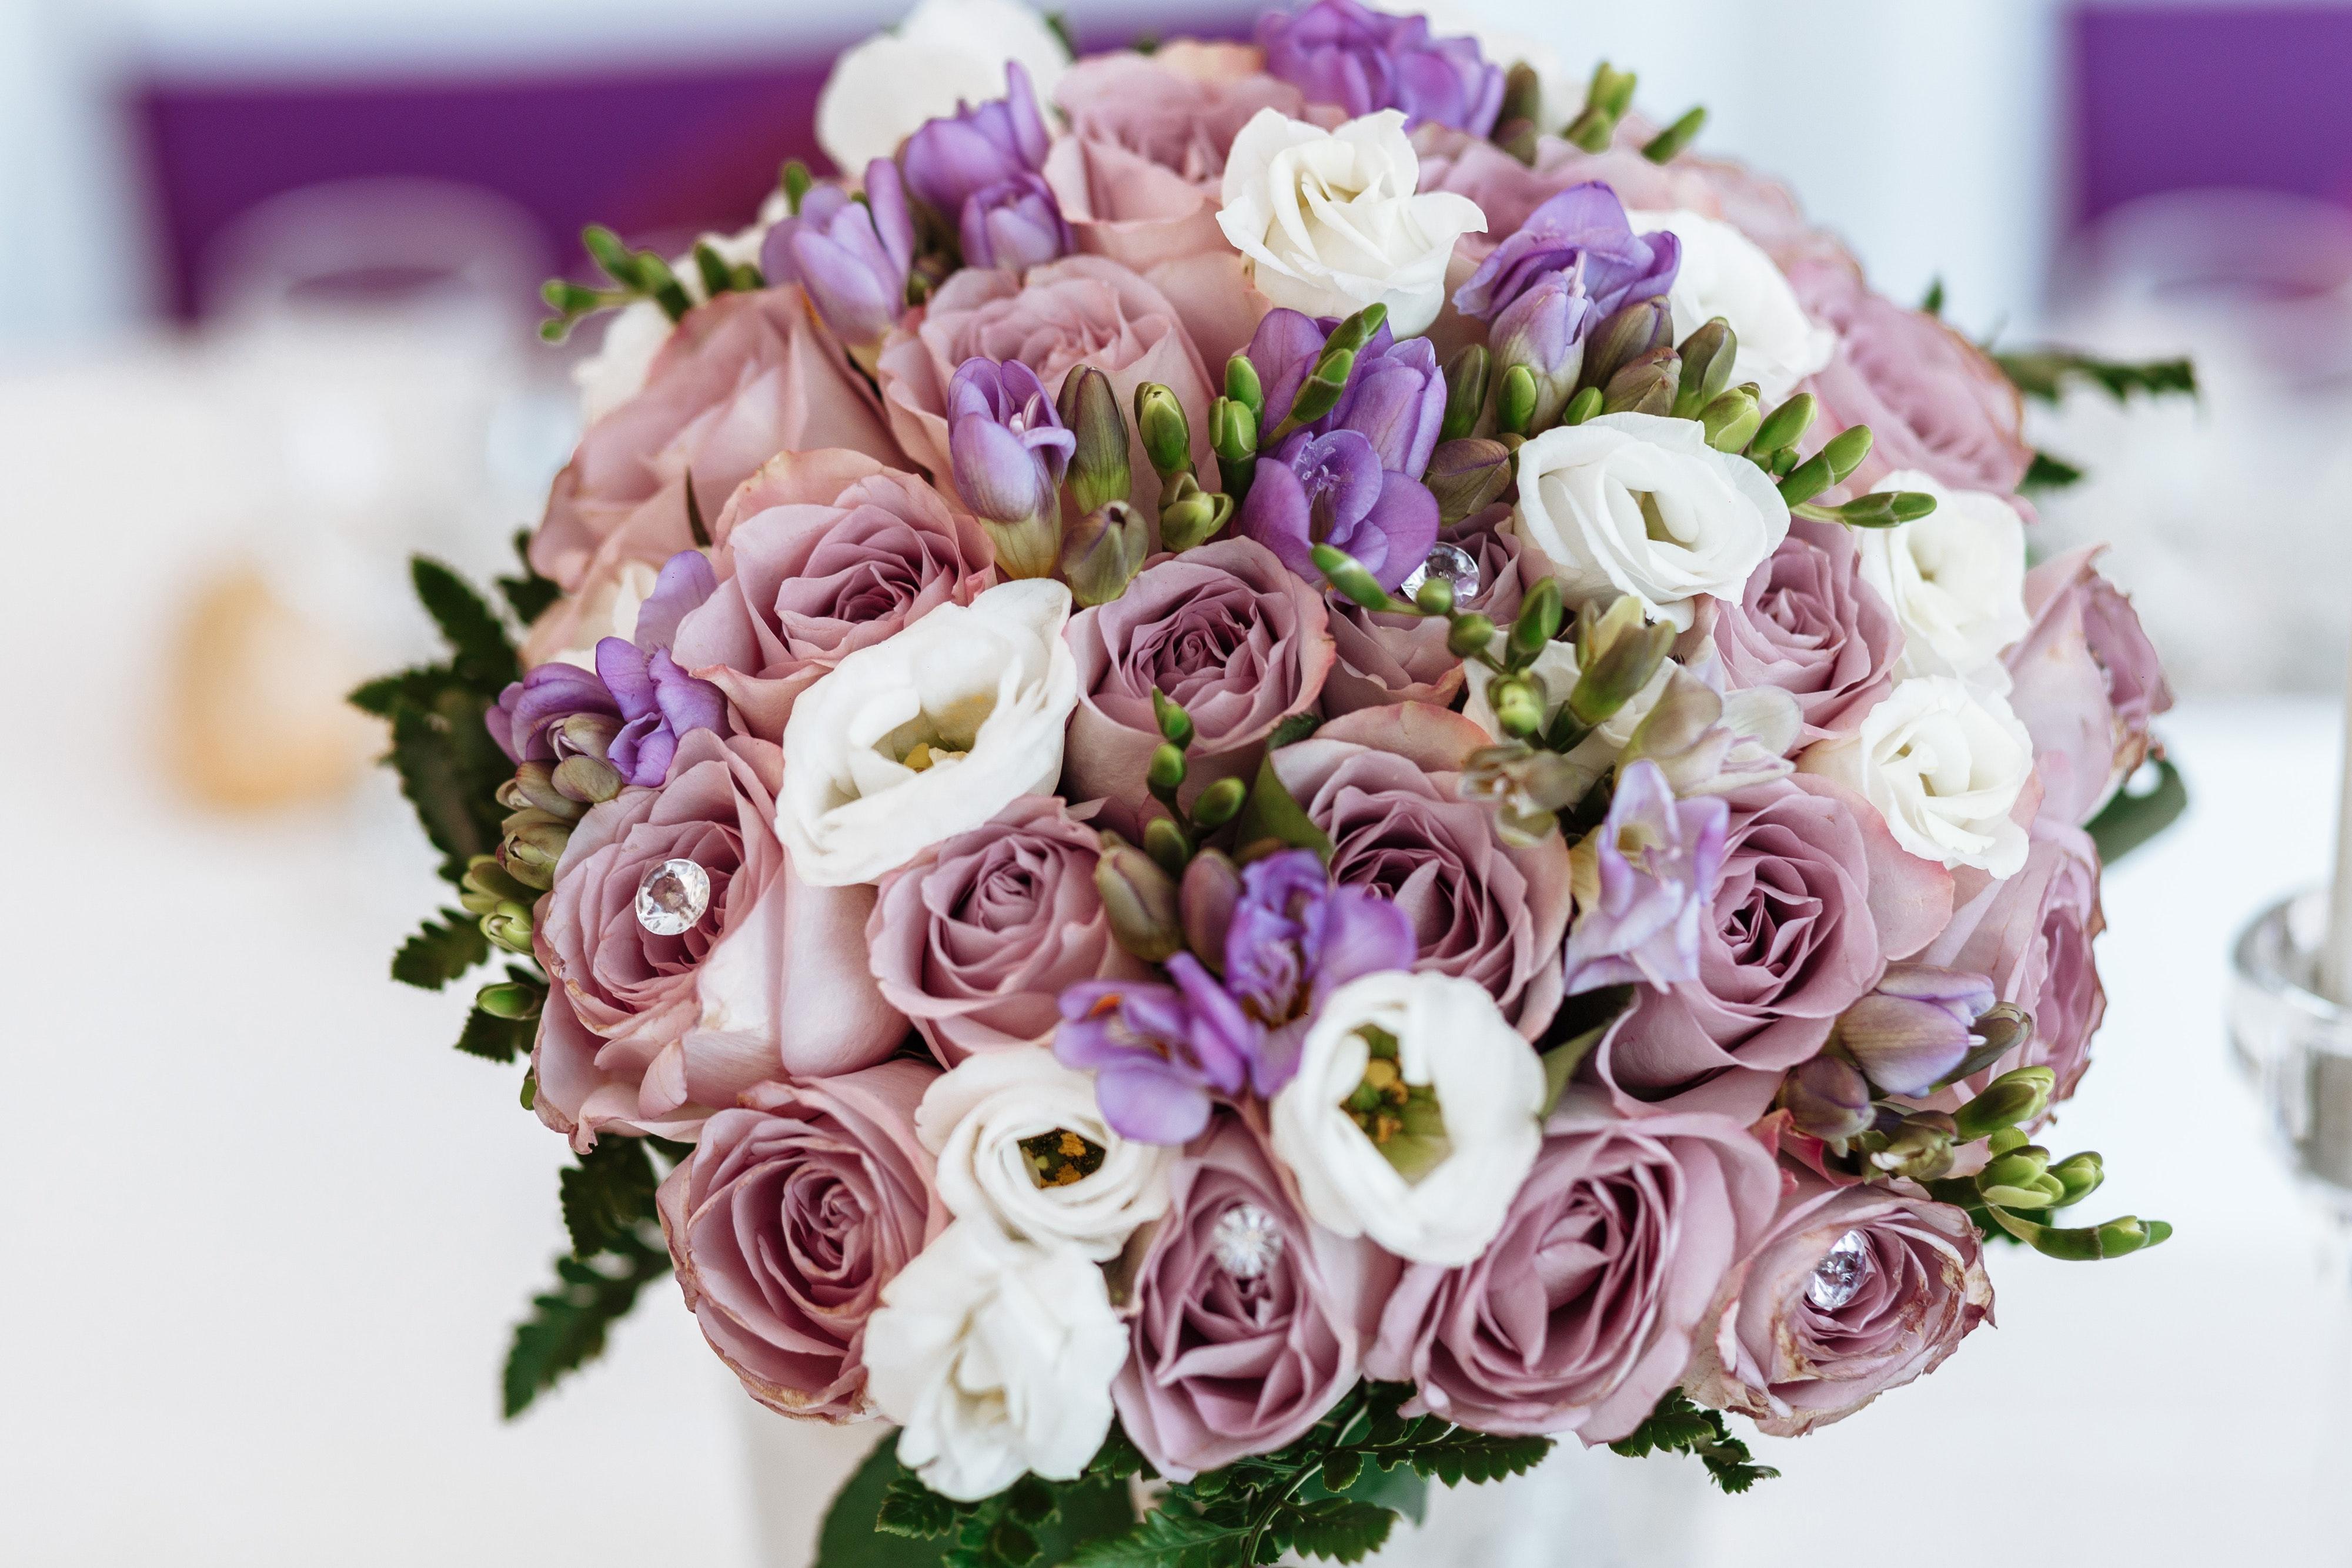 1000 Beautiful Single Flower Photos Pexels Free Stock: 1000+ Engaging Flower Bouquet Photos · Pexels · Free Stock